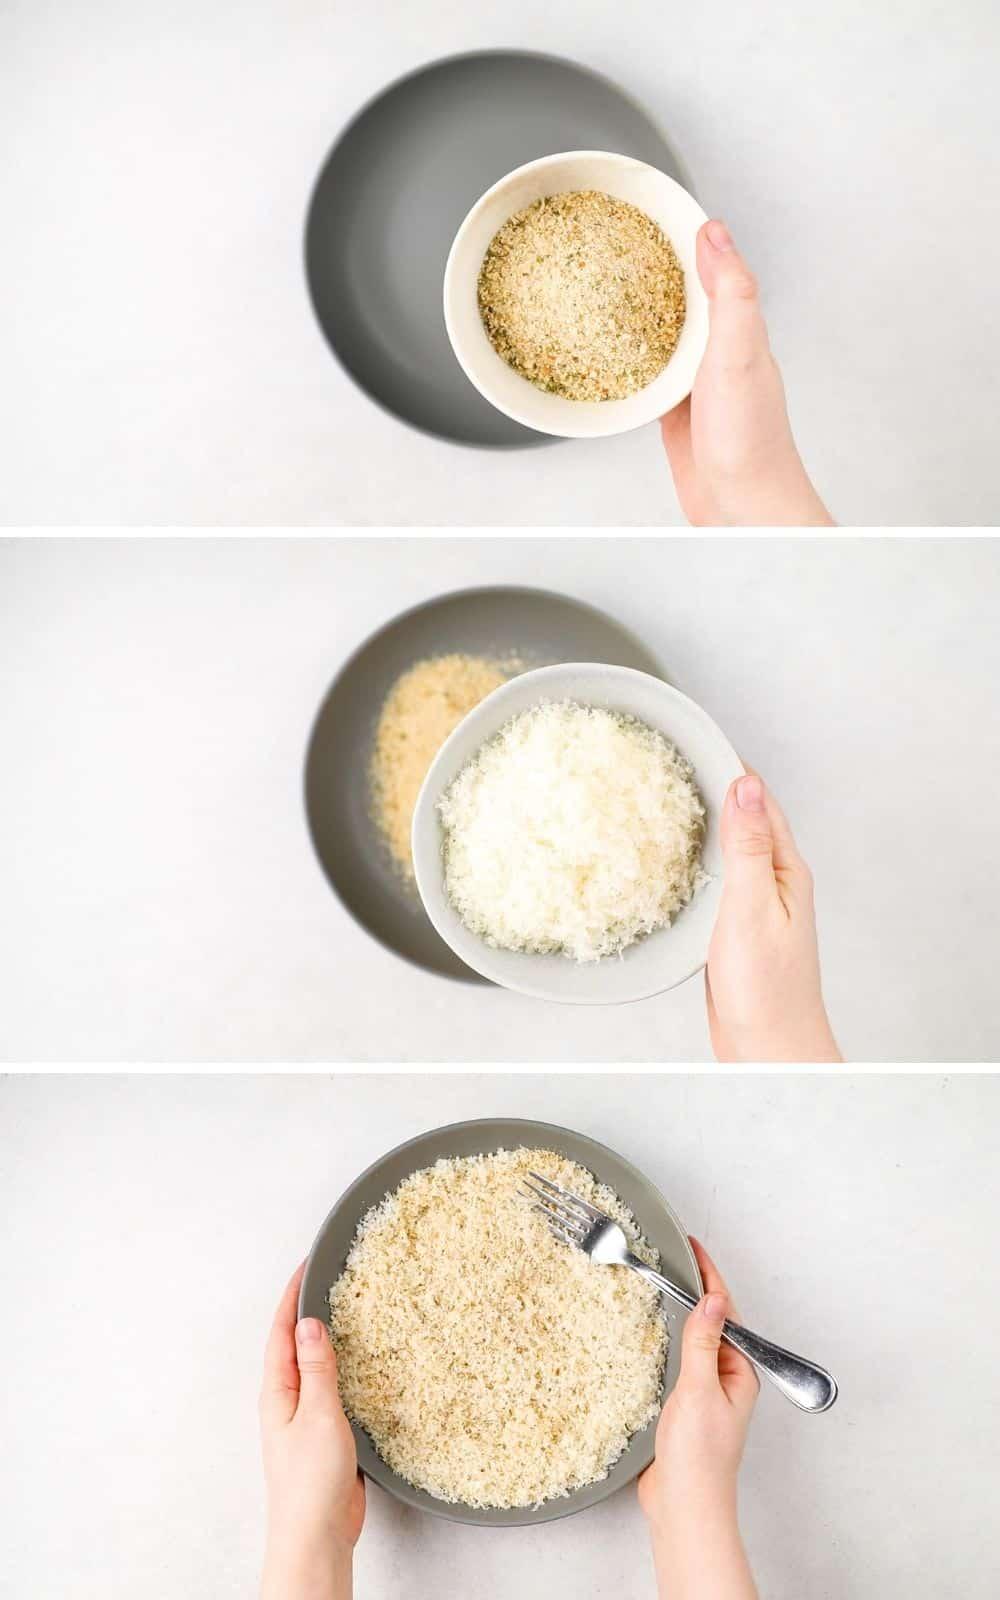 Process photos of mixing panko crumbs and Parmesan cheese.